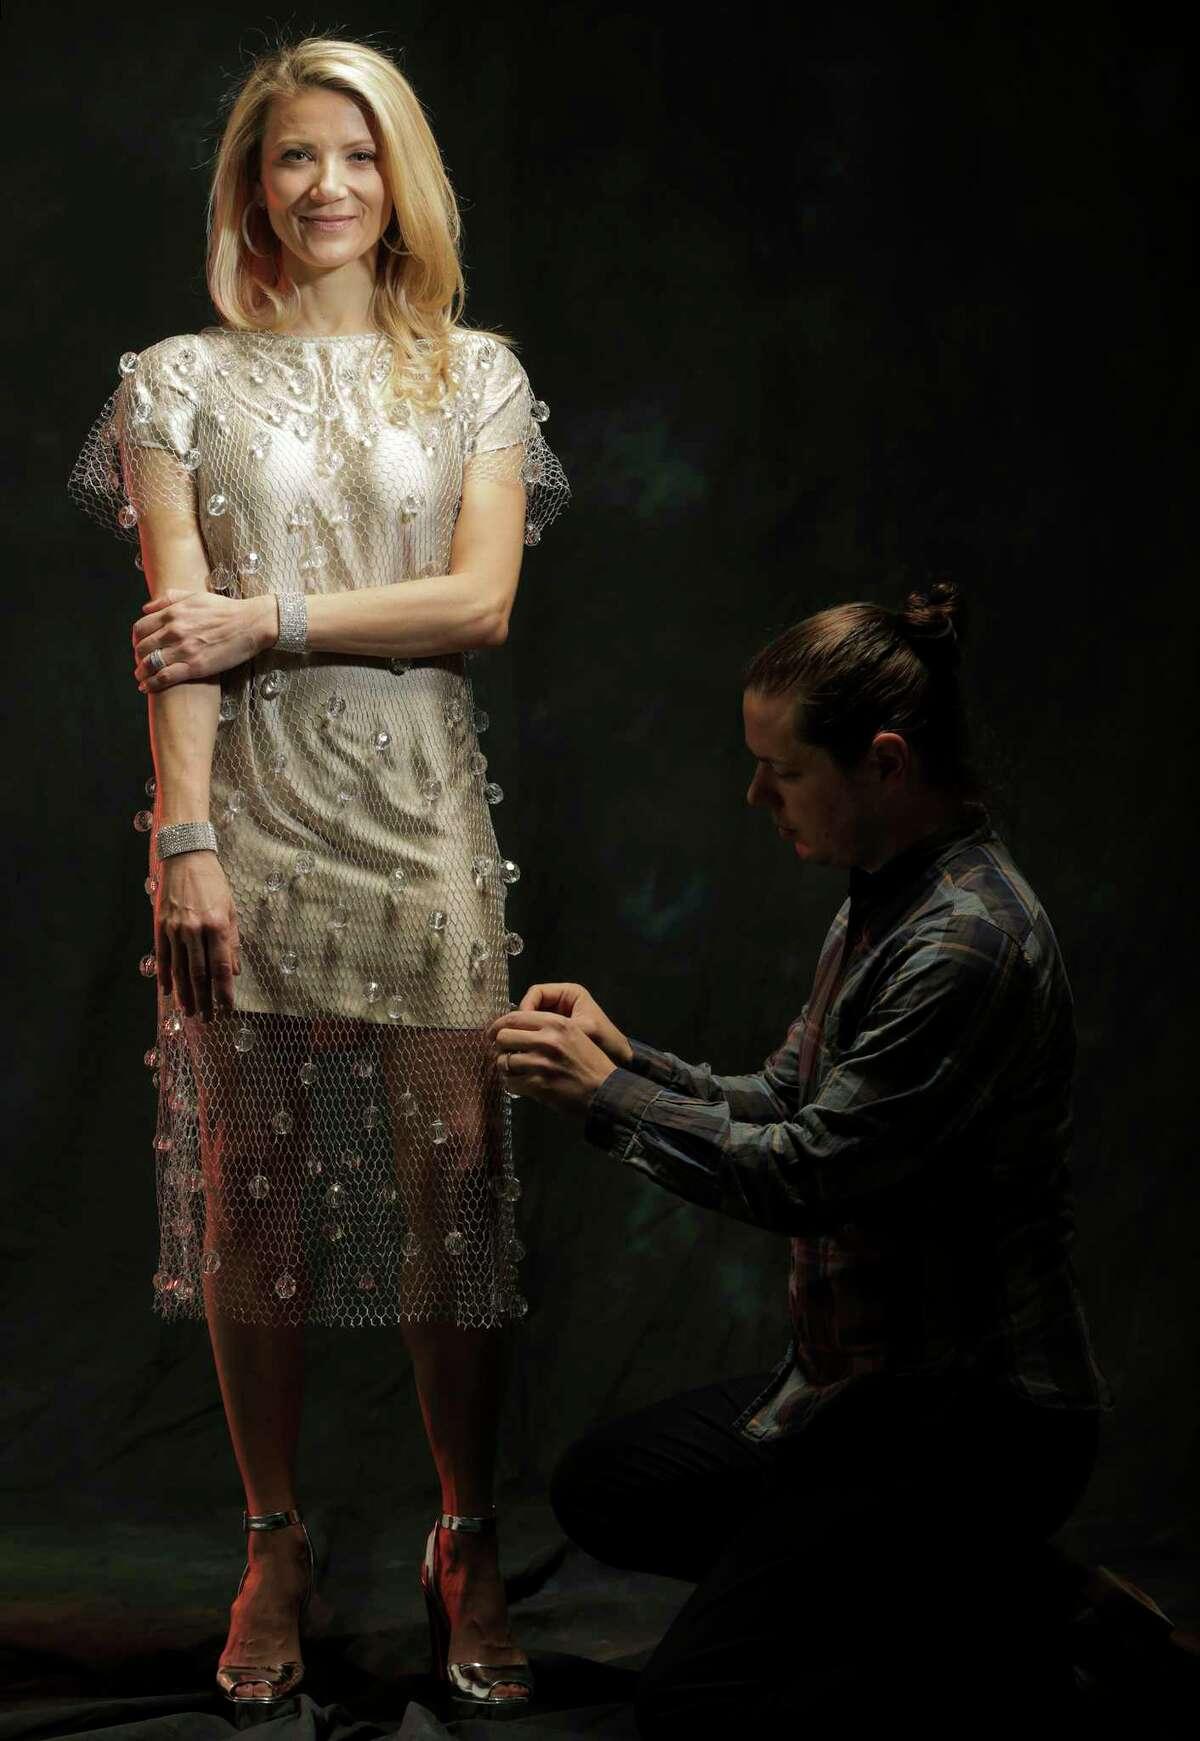 Fresh Arts Ball co-chair Stephanie Cockrell models Miles David designer David Peck's custom dress for the